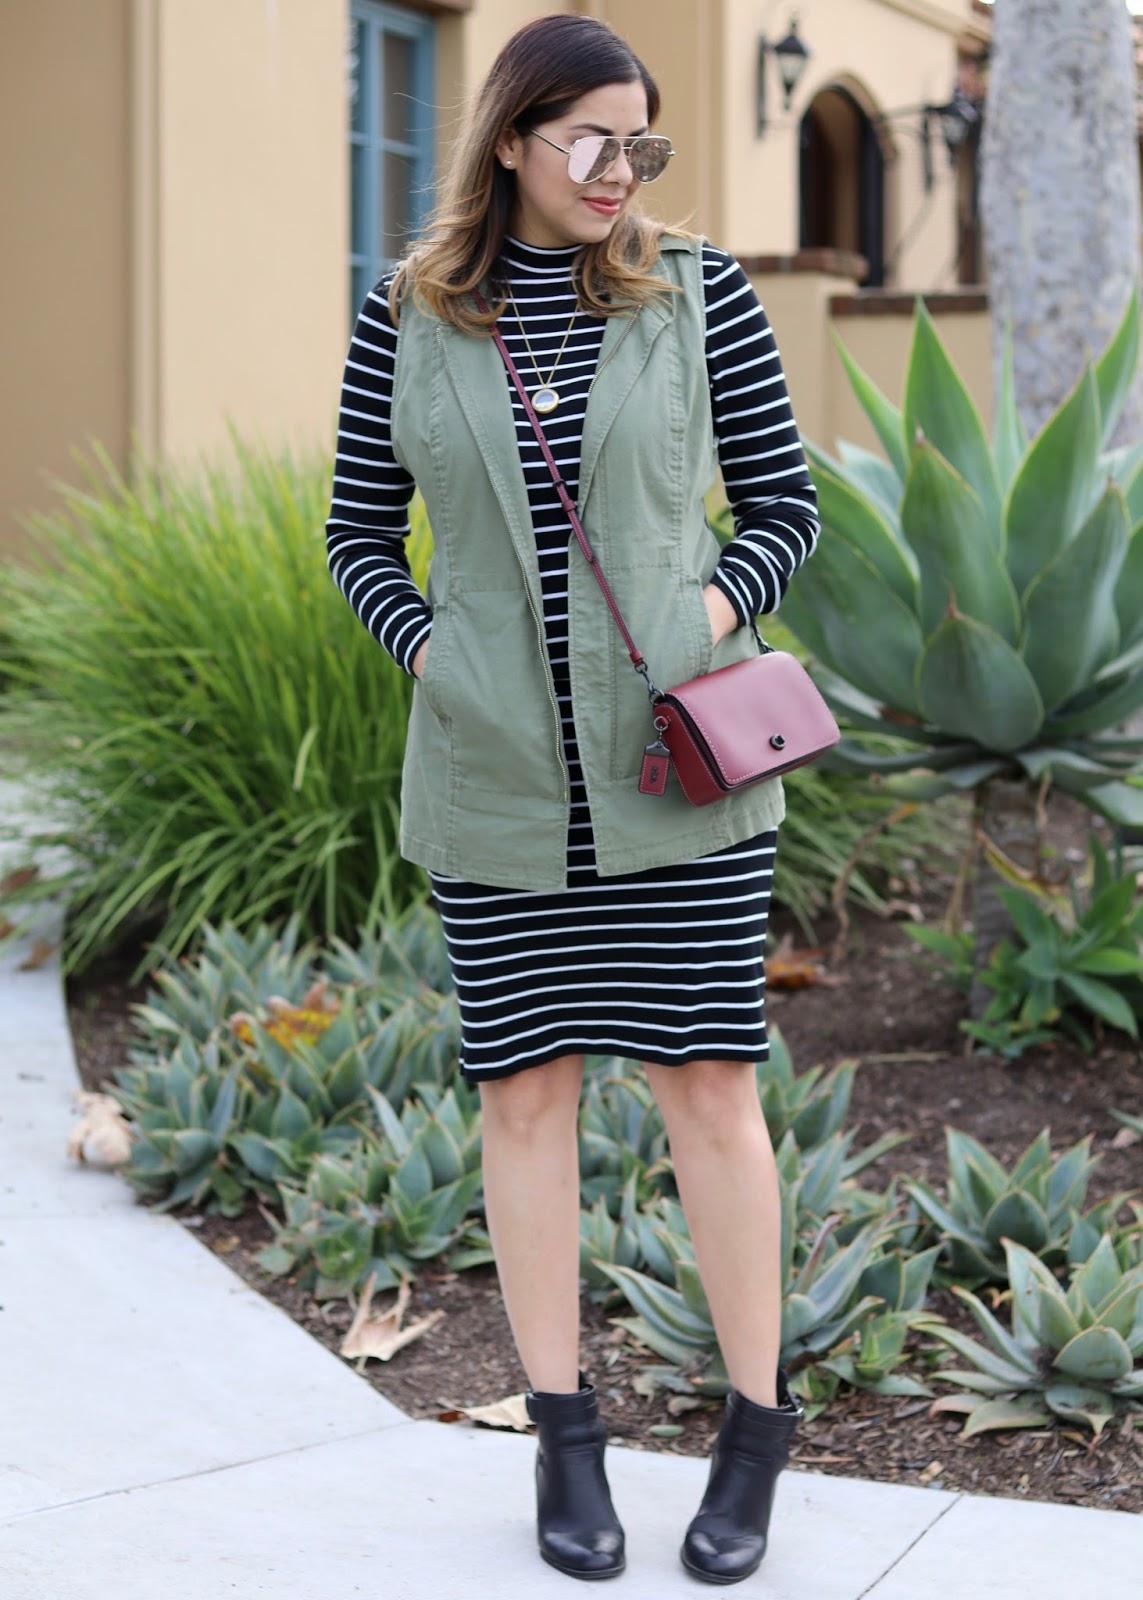 San Diego Fashion Blogger, so cal fashion blogger, san diego style blogger